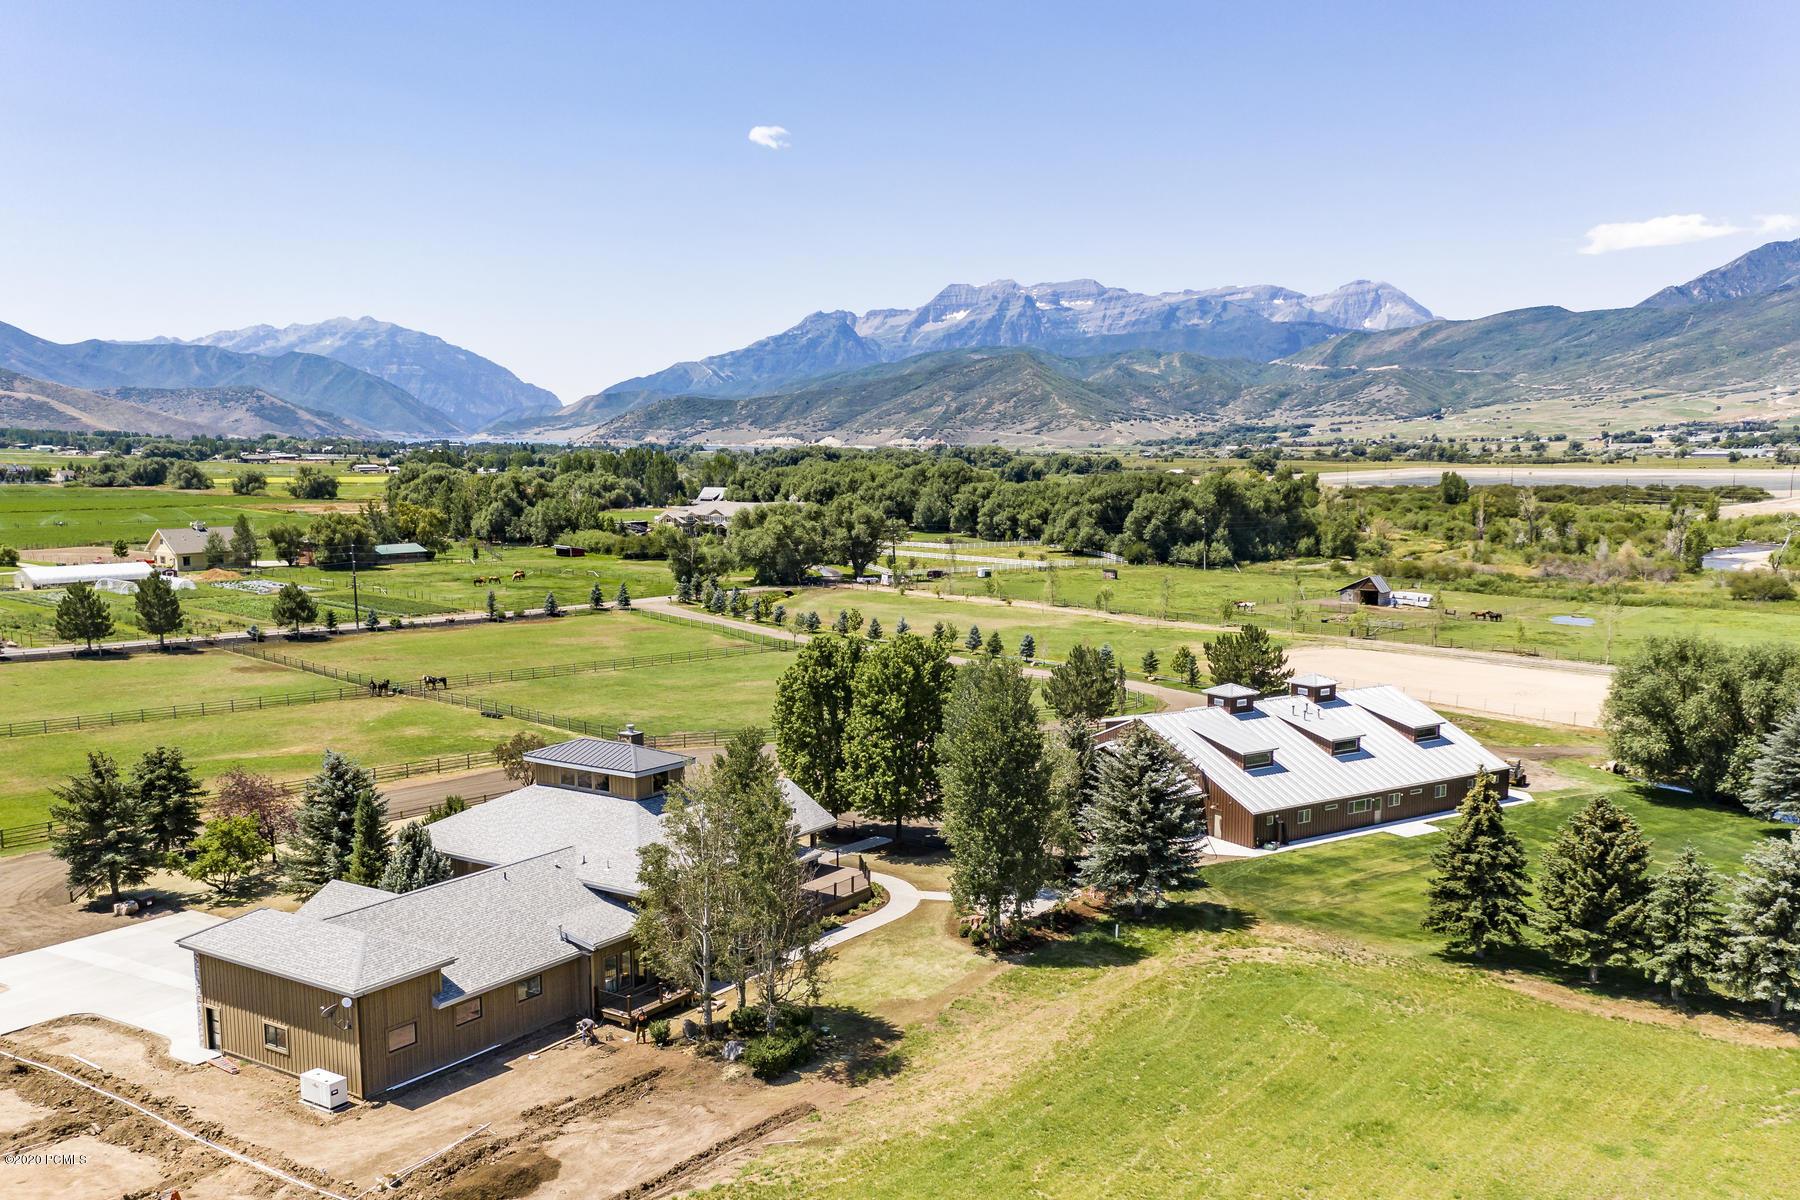 1866 650 South, Heber City, Utah 84032, 4 Bedrooms Bedrooms, ,4 BathroomsBathrooms,Single Family,For Sale,650,12002593